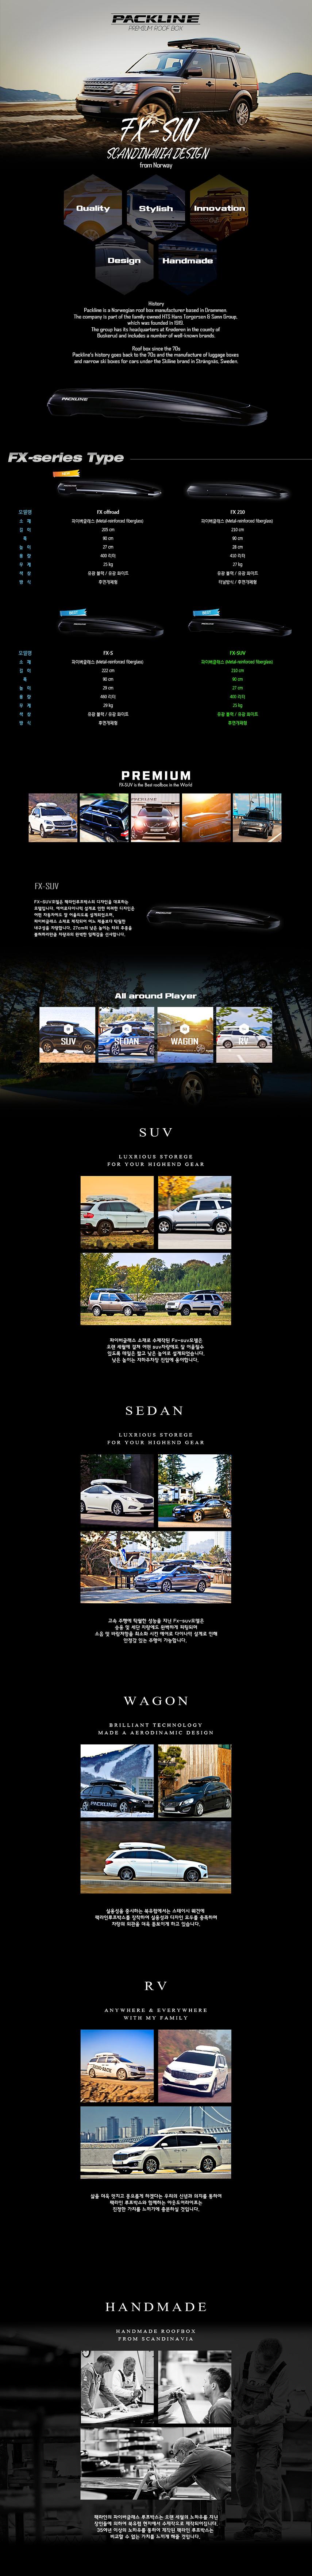 FX-SUV 팩라인루프박스 상세페이지01.jpg